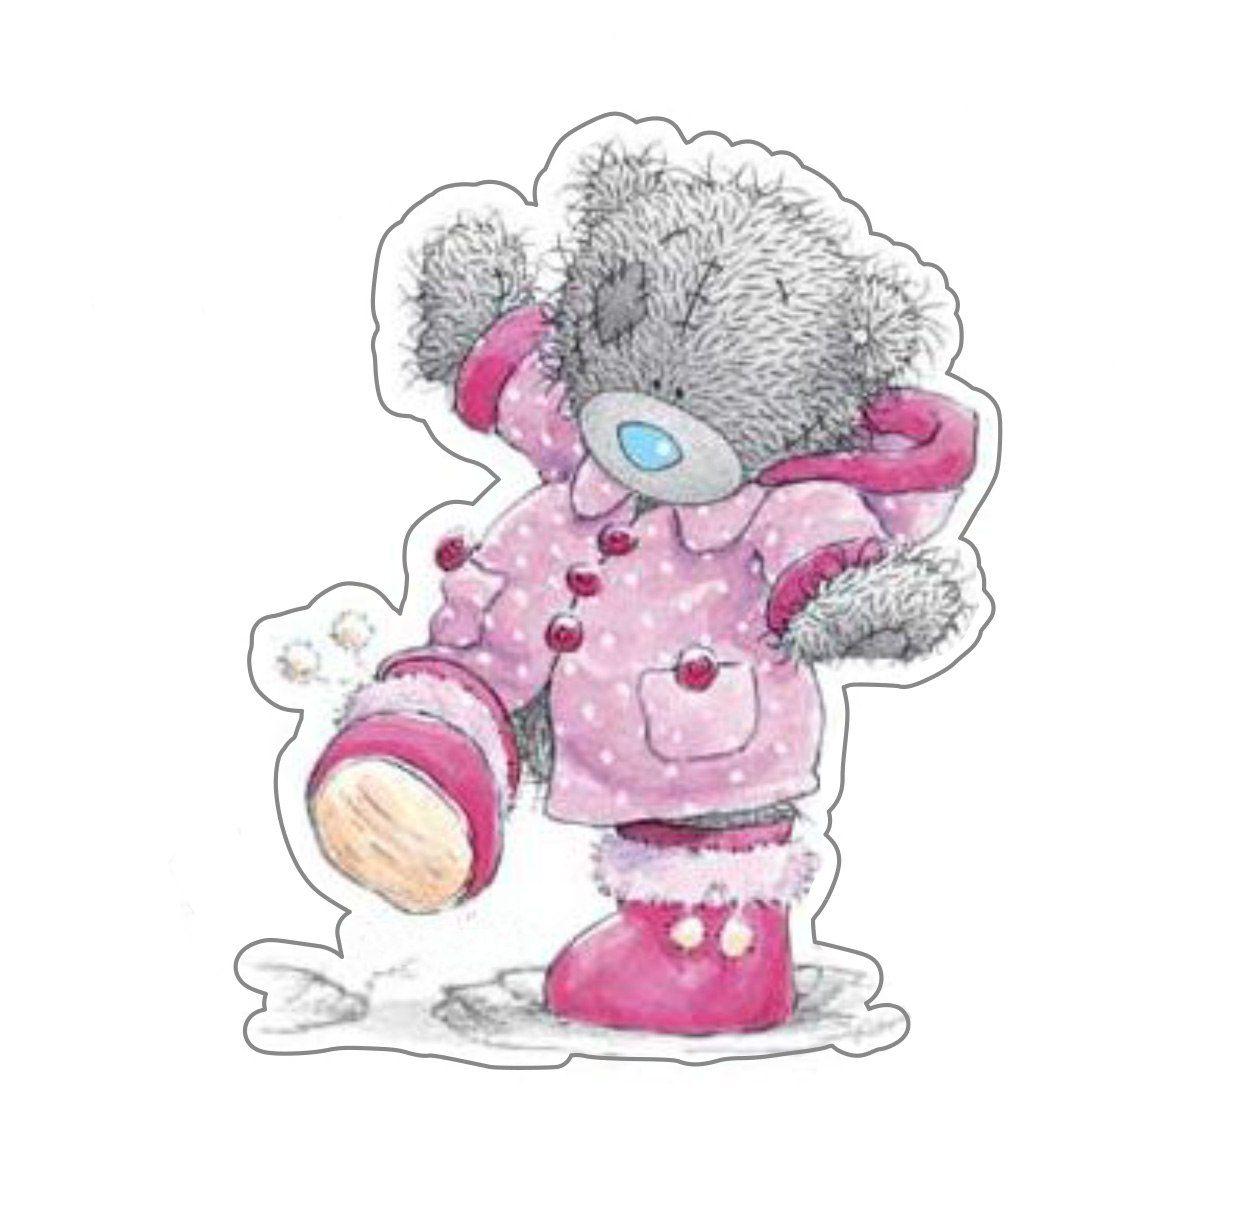 Мишка тедди рисунок девочка